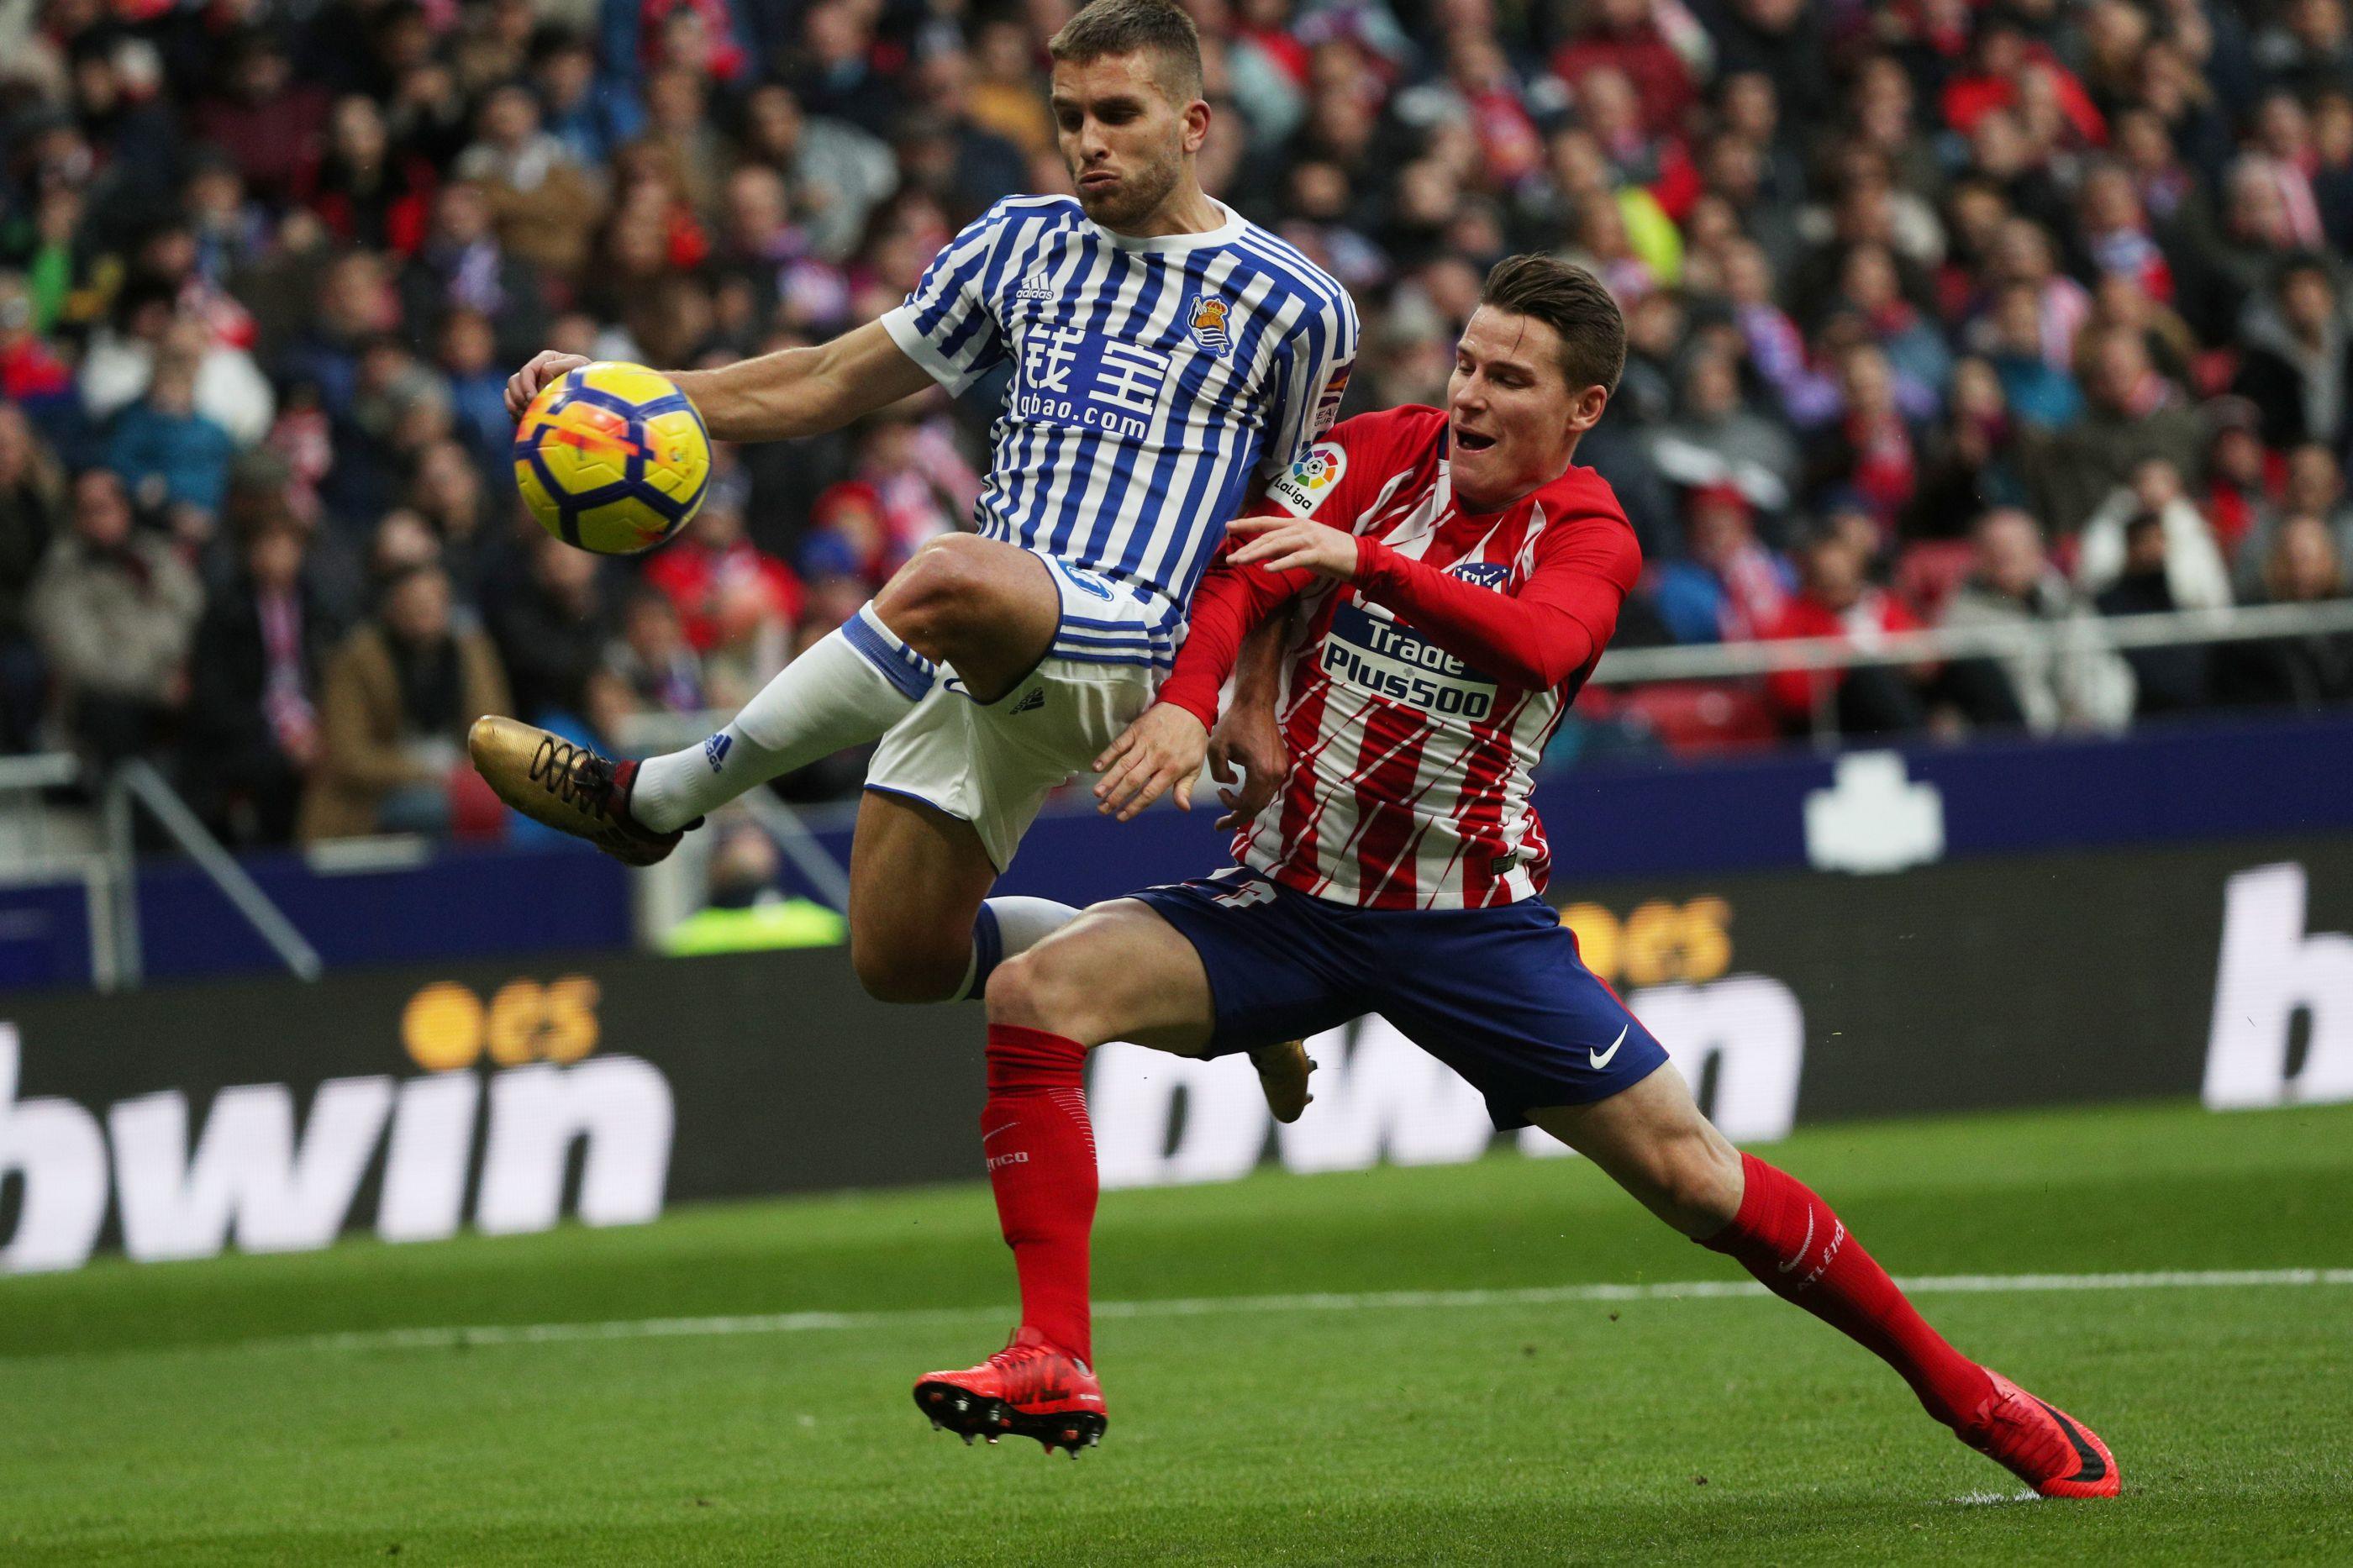 Oferta por Kevin Rodrigues estará a ser estudada pelo Sporting